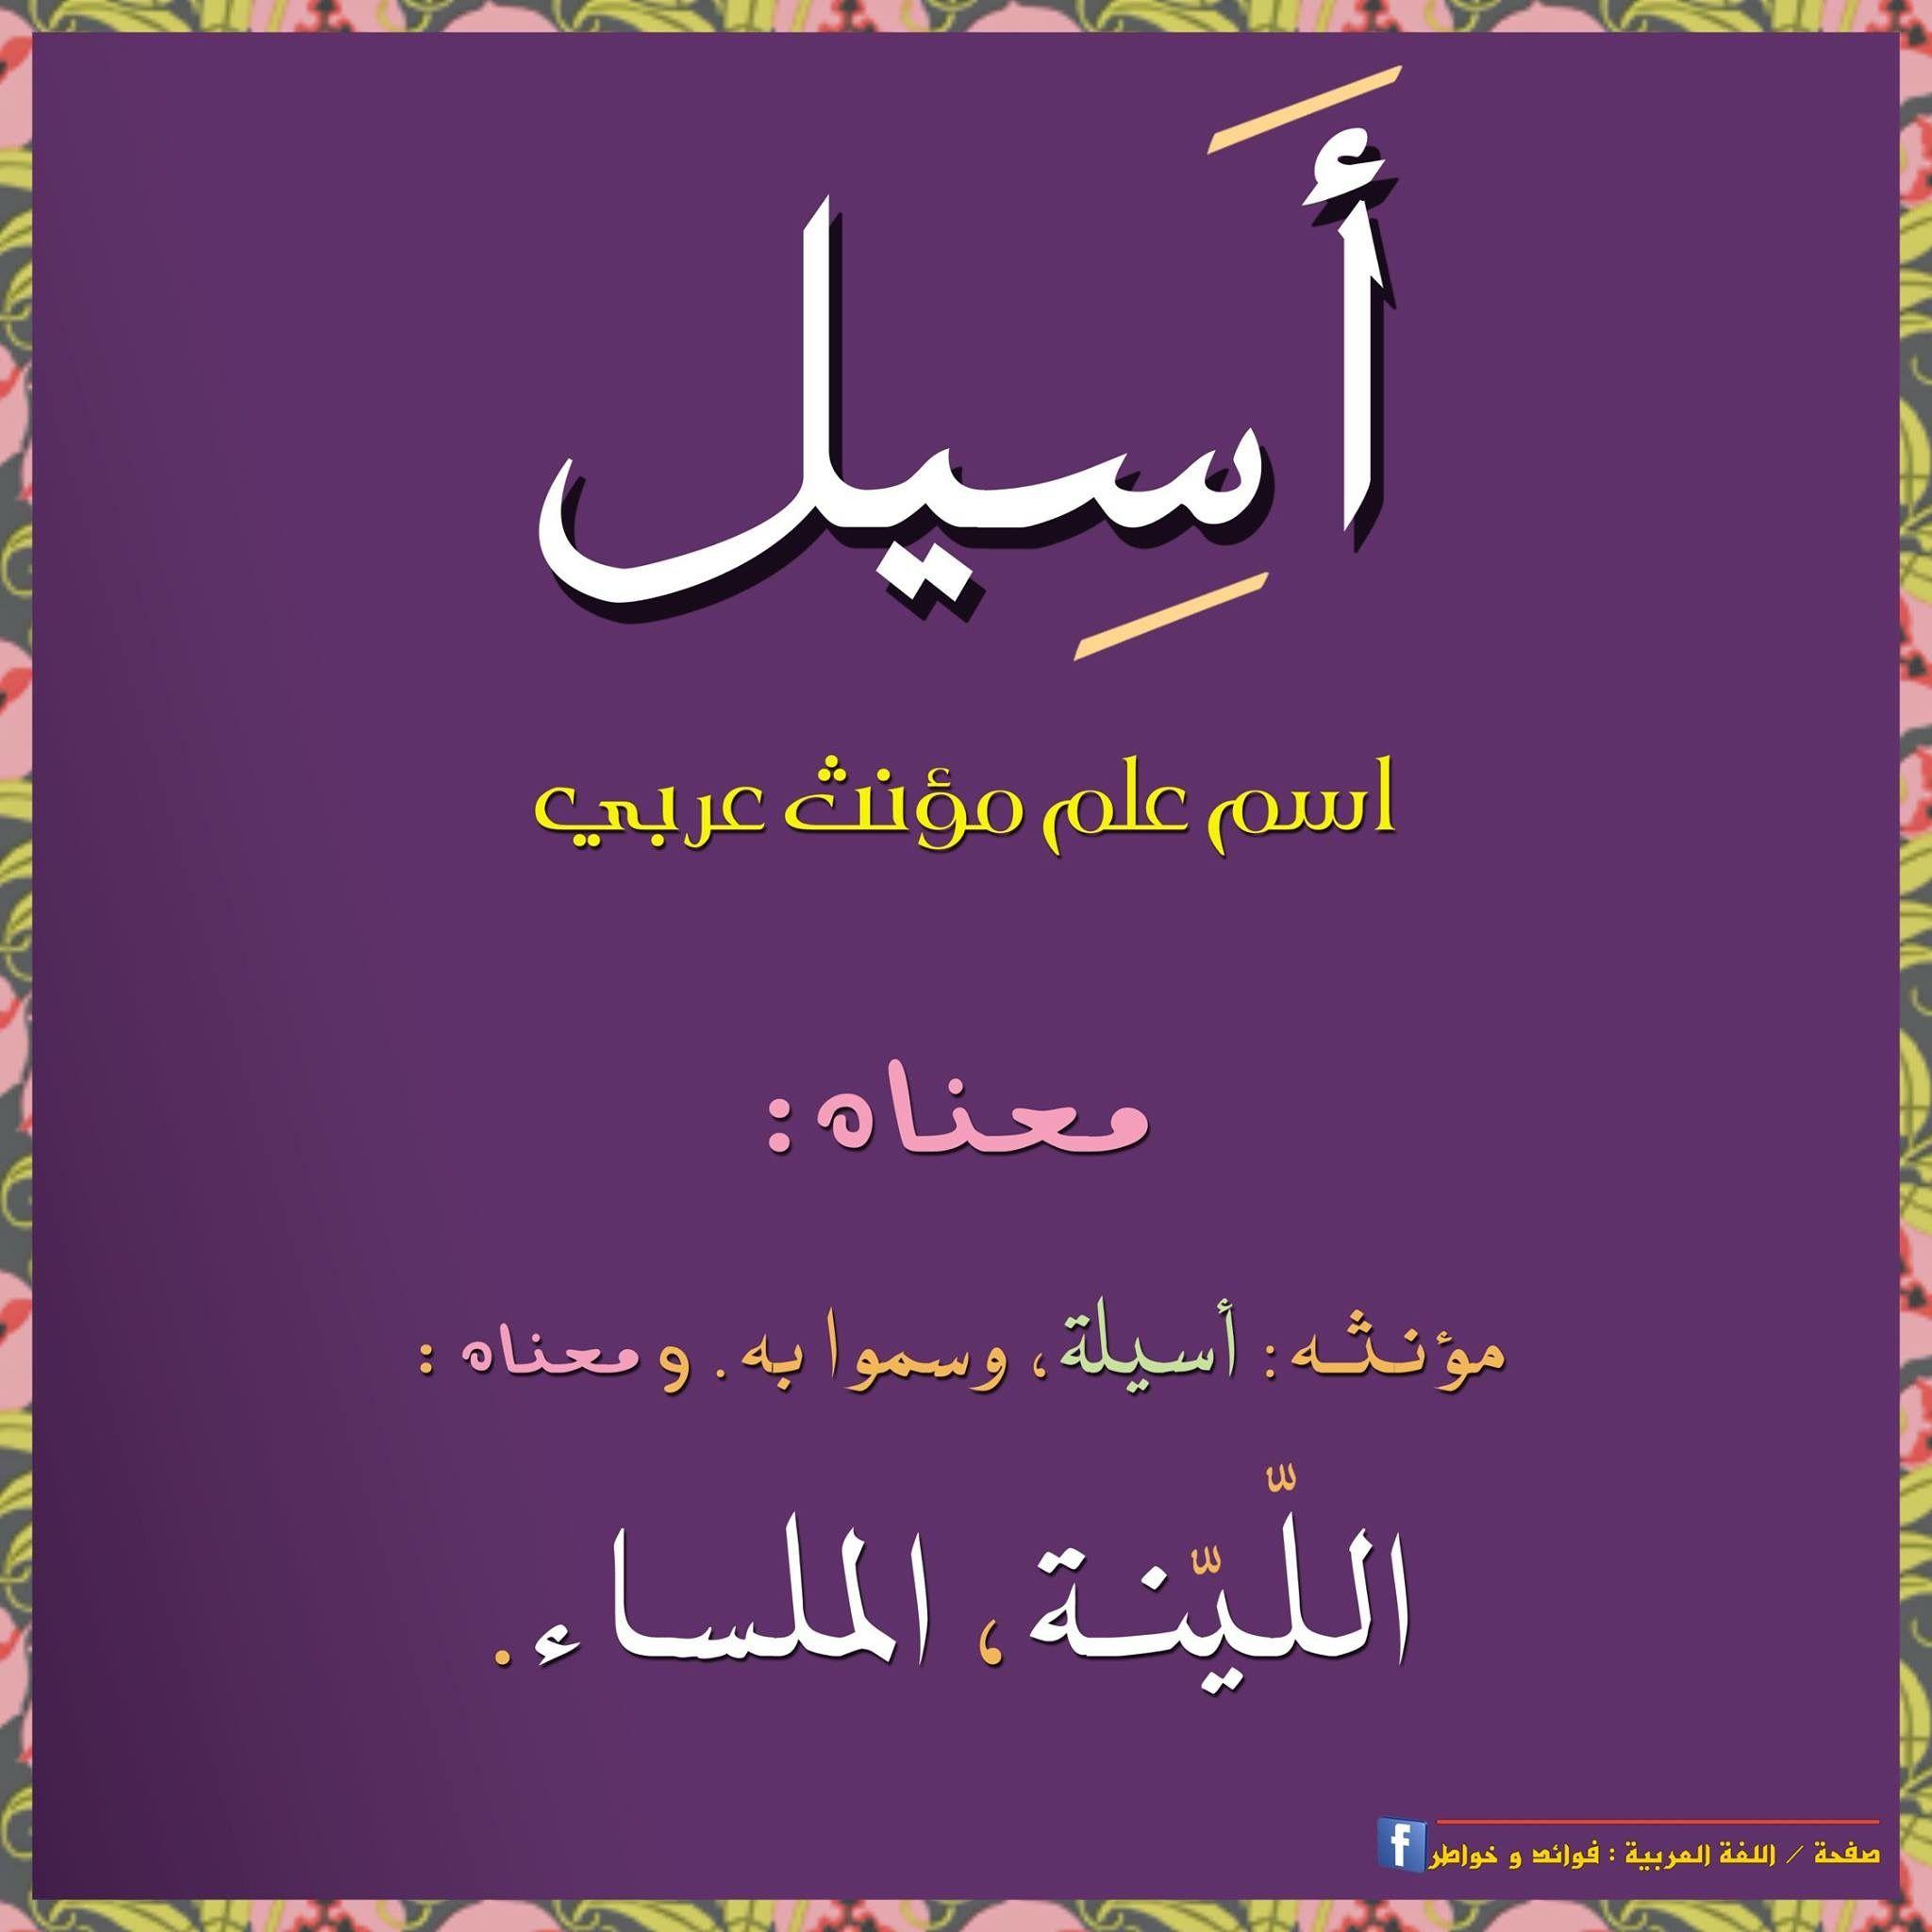 Pin By Hajar Toubali On منوعة عربية Arabic Baby Names Words Learn Arabic Language